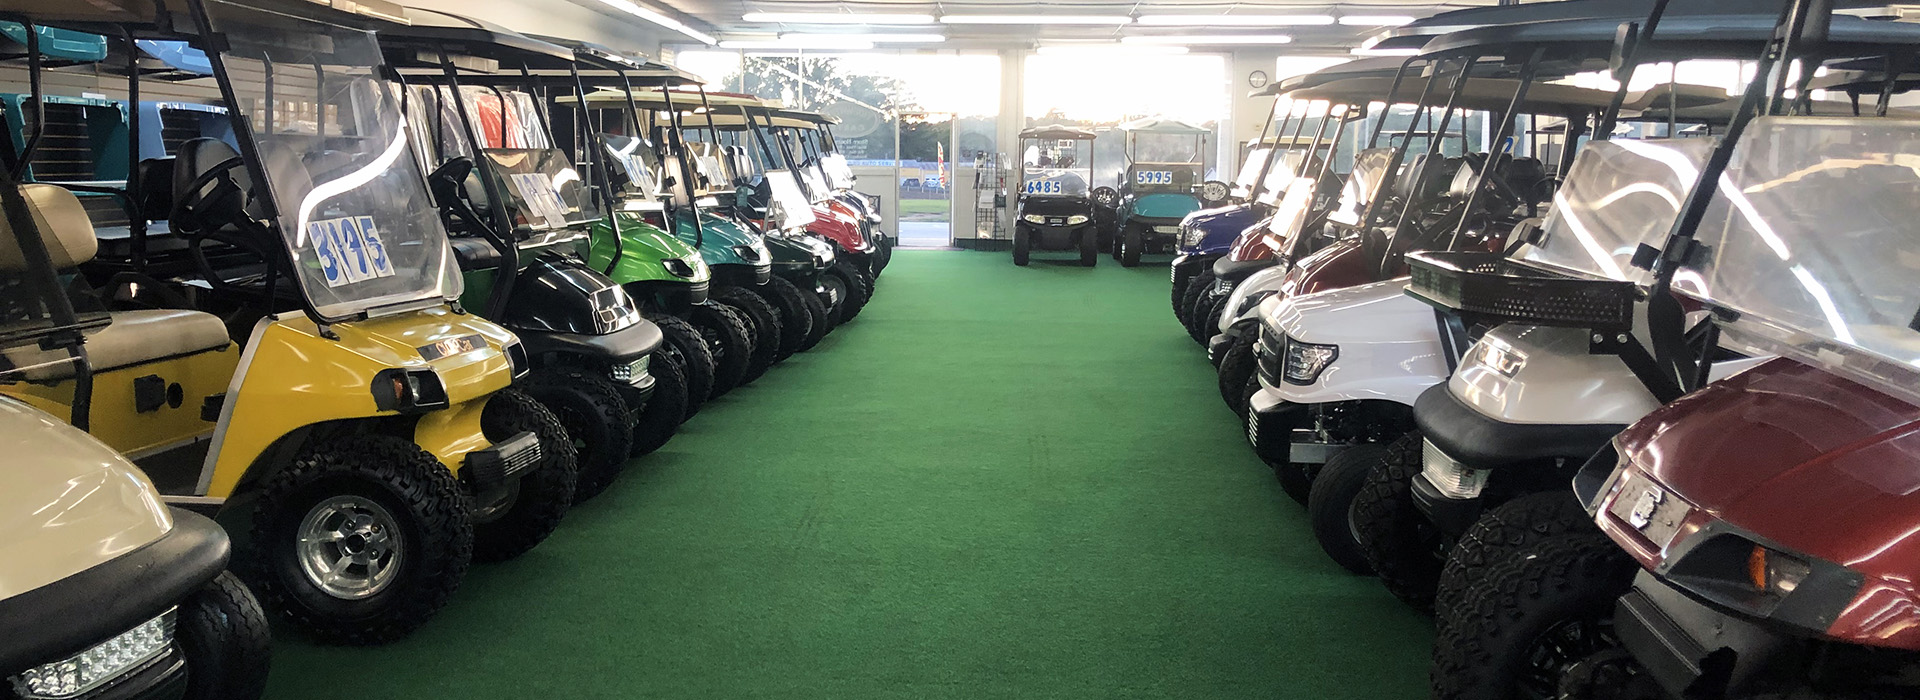 Tidewater-Golf-Carts-Slide-4